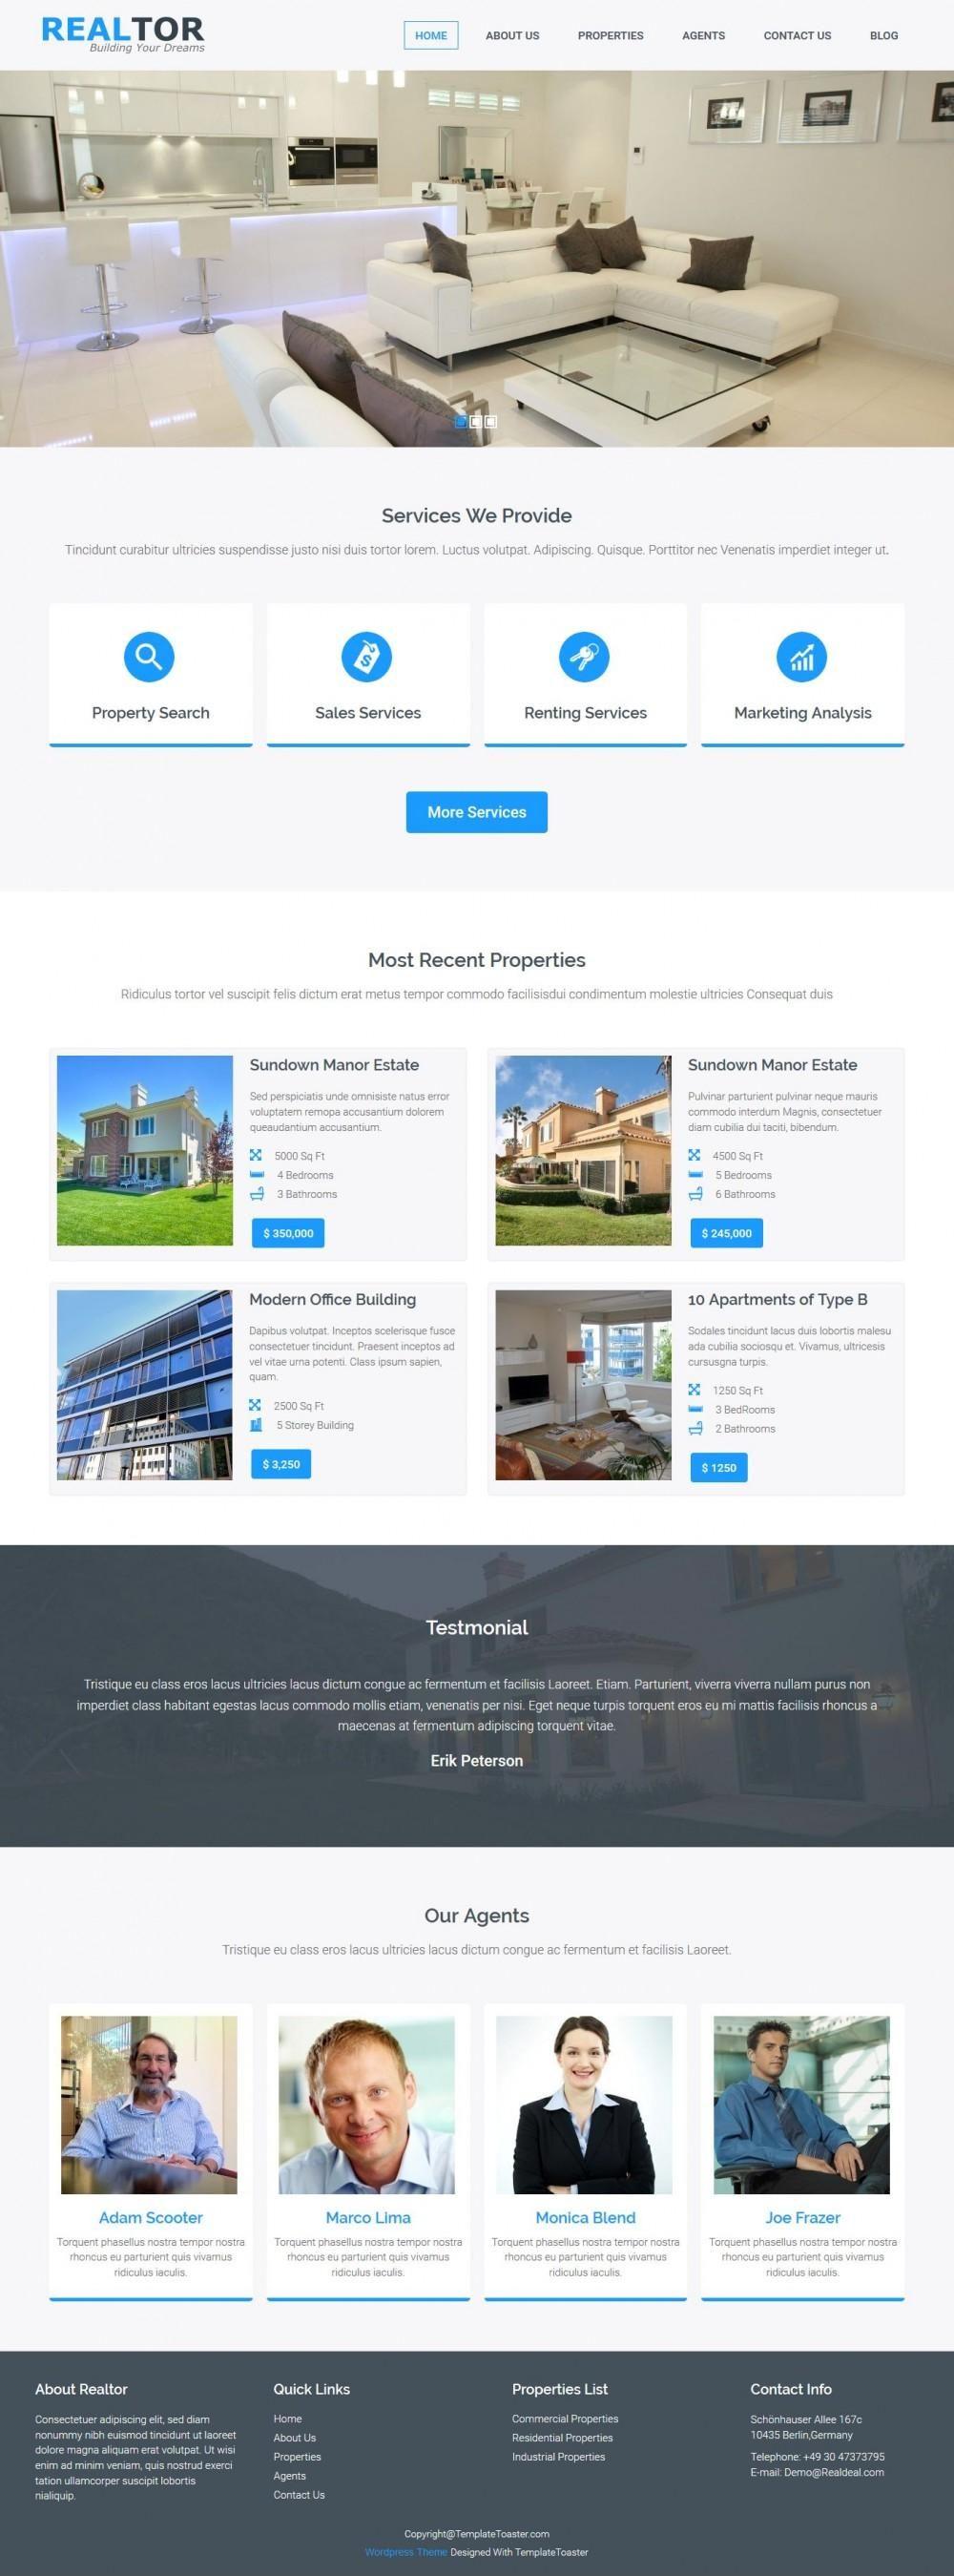 Realtor - Real Estate WordPress Theme